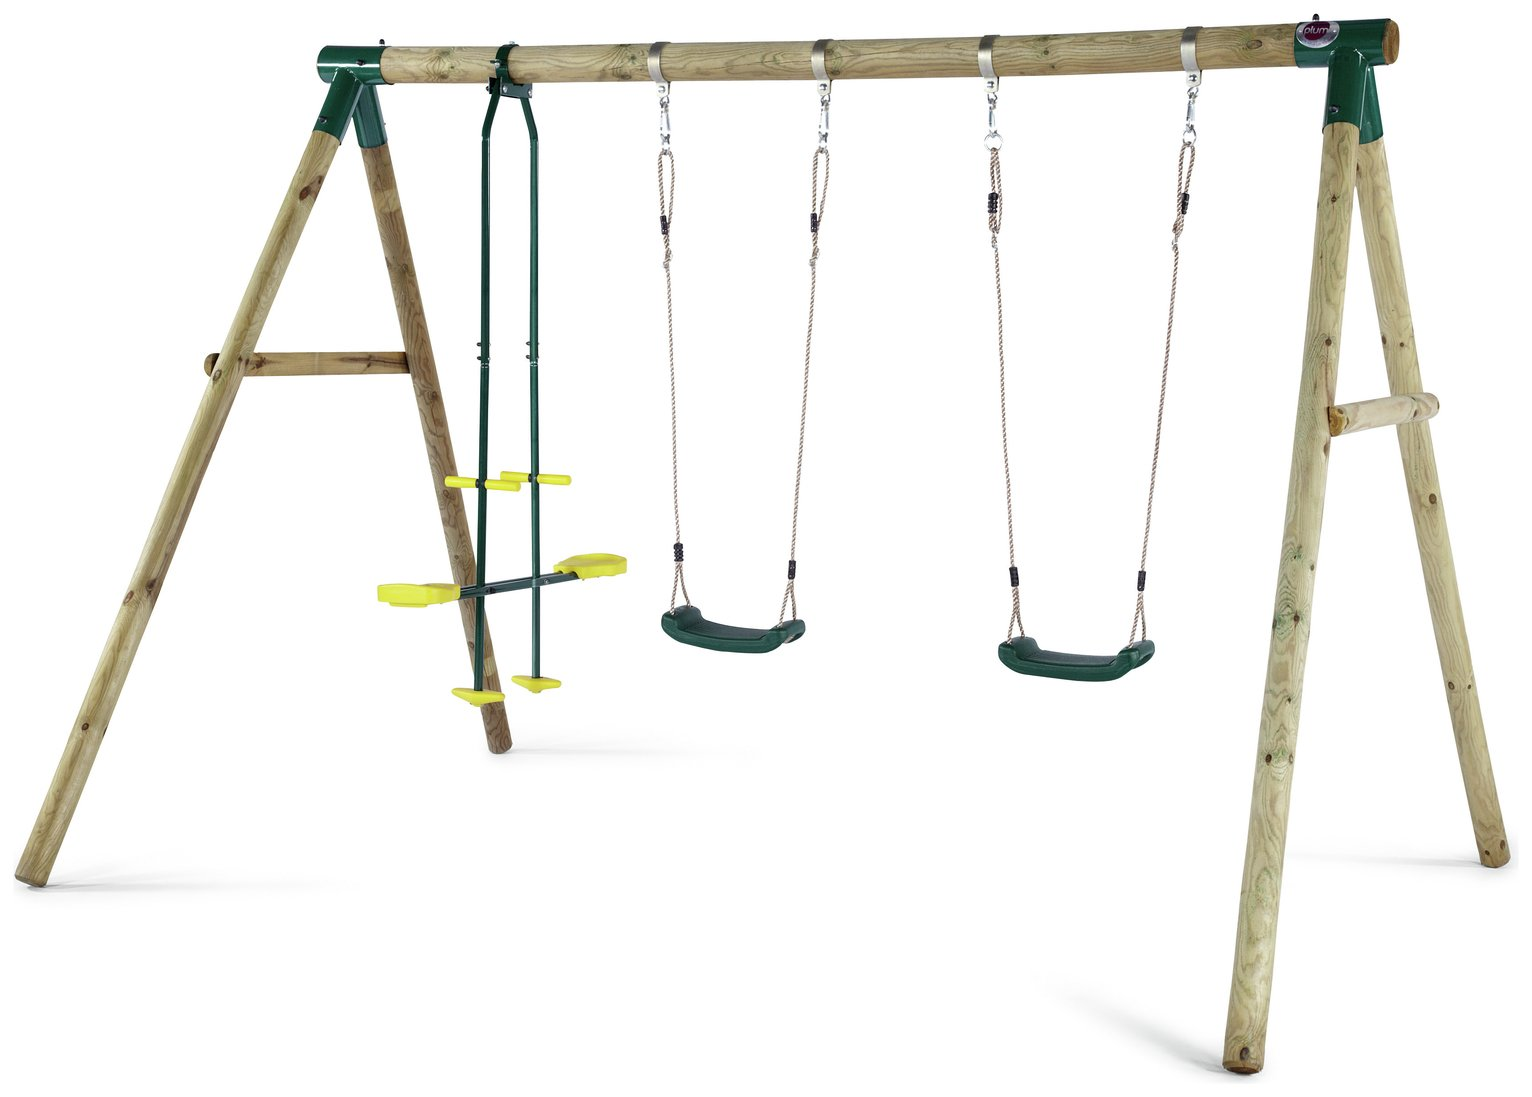 plum gibbon wooden garden swing set. Black Bedroom Furniture Sets. Home Design Ideas